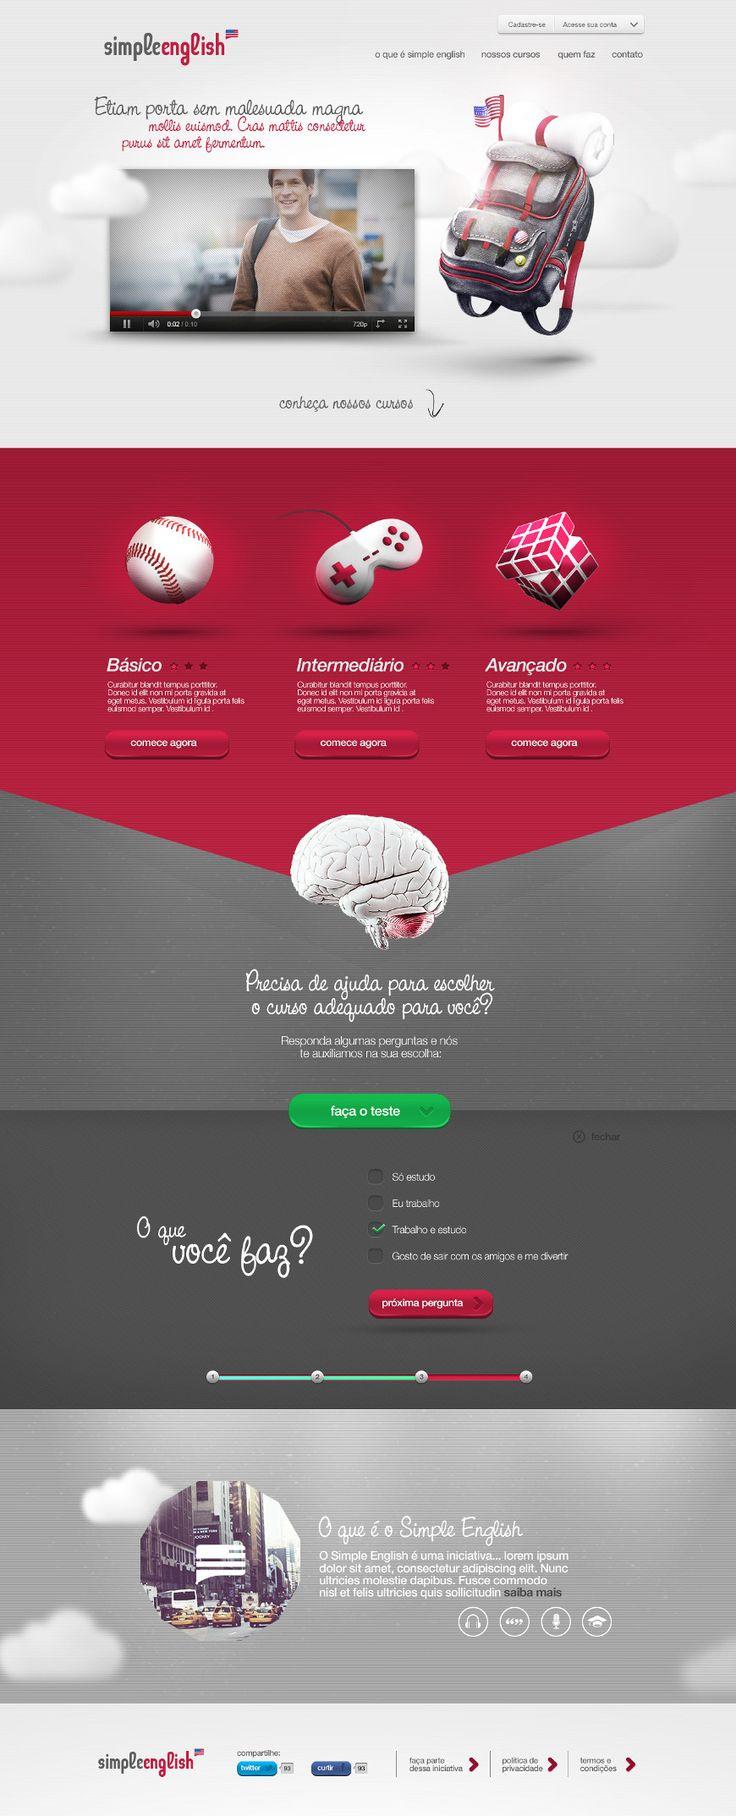 Simple English - Designer - Vinícius Costa / Portfólio | #webdesign #it #web #design #layout #userinterface #website #webdesign